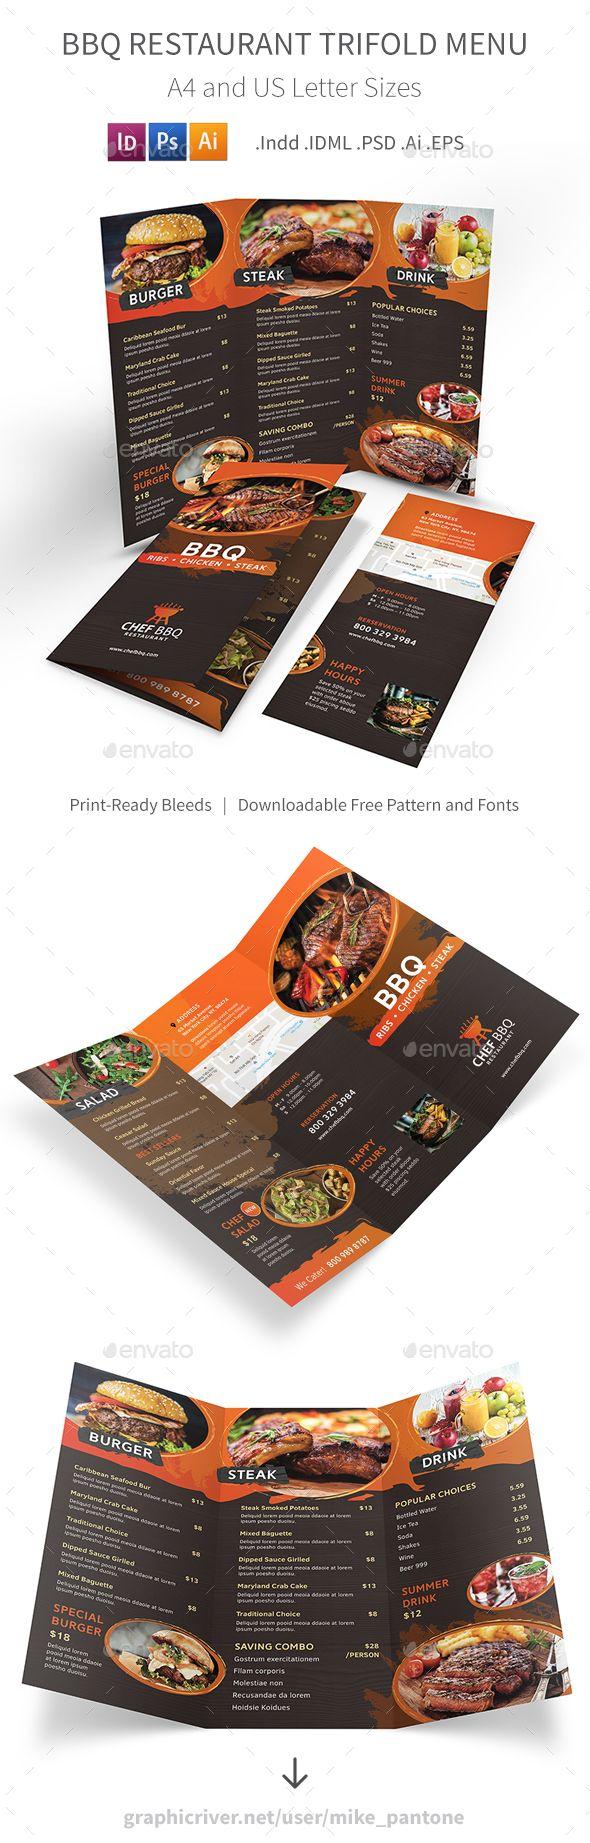 Best Trifold Restaurant Menu Template Images On Pinterest - Tri fold menu template